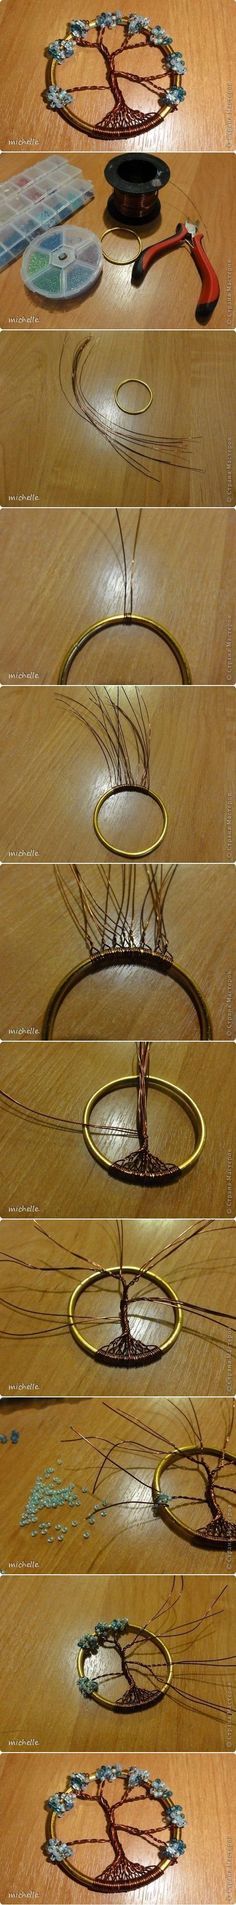 DIY Tree of Life DIY Projects   UsefulDIY.com Follow us on Facebook ==> https://www.facebook.com/UsefulDiy